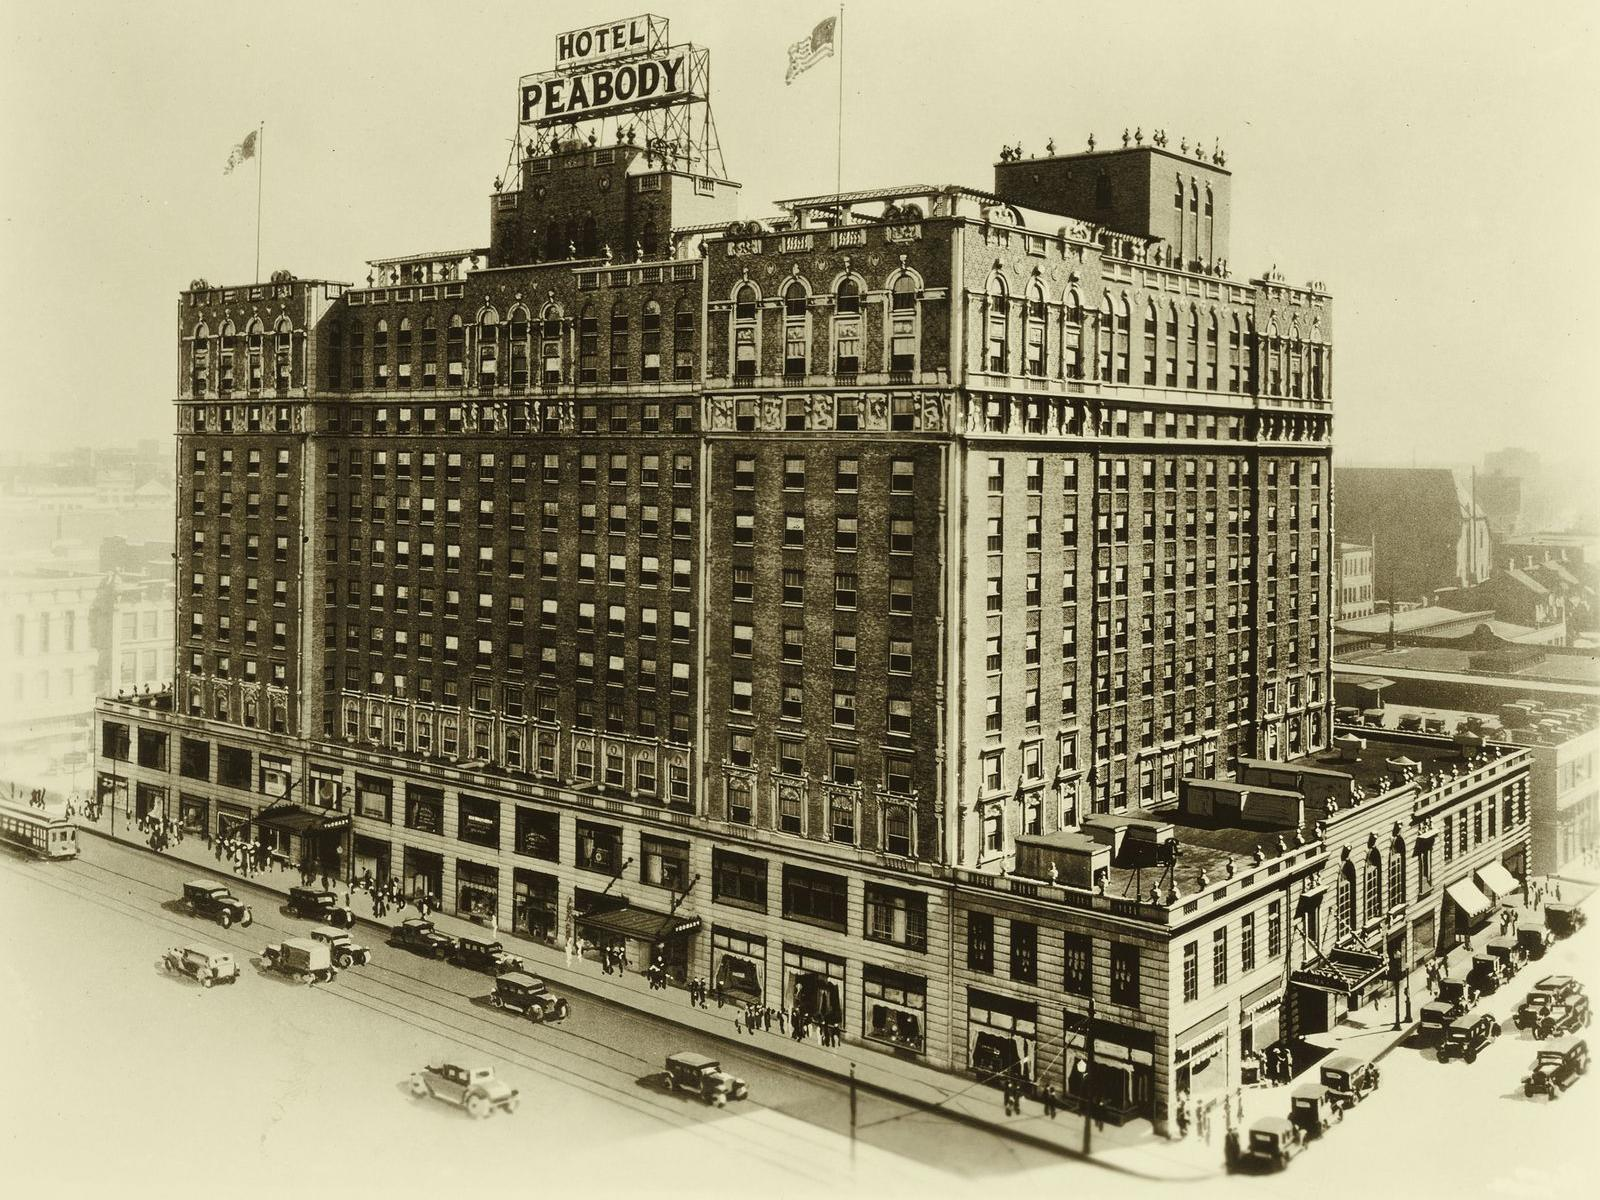 Historical Photo of Peabody Hotel Exterior